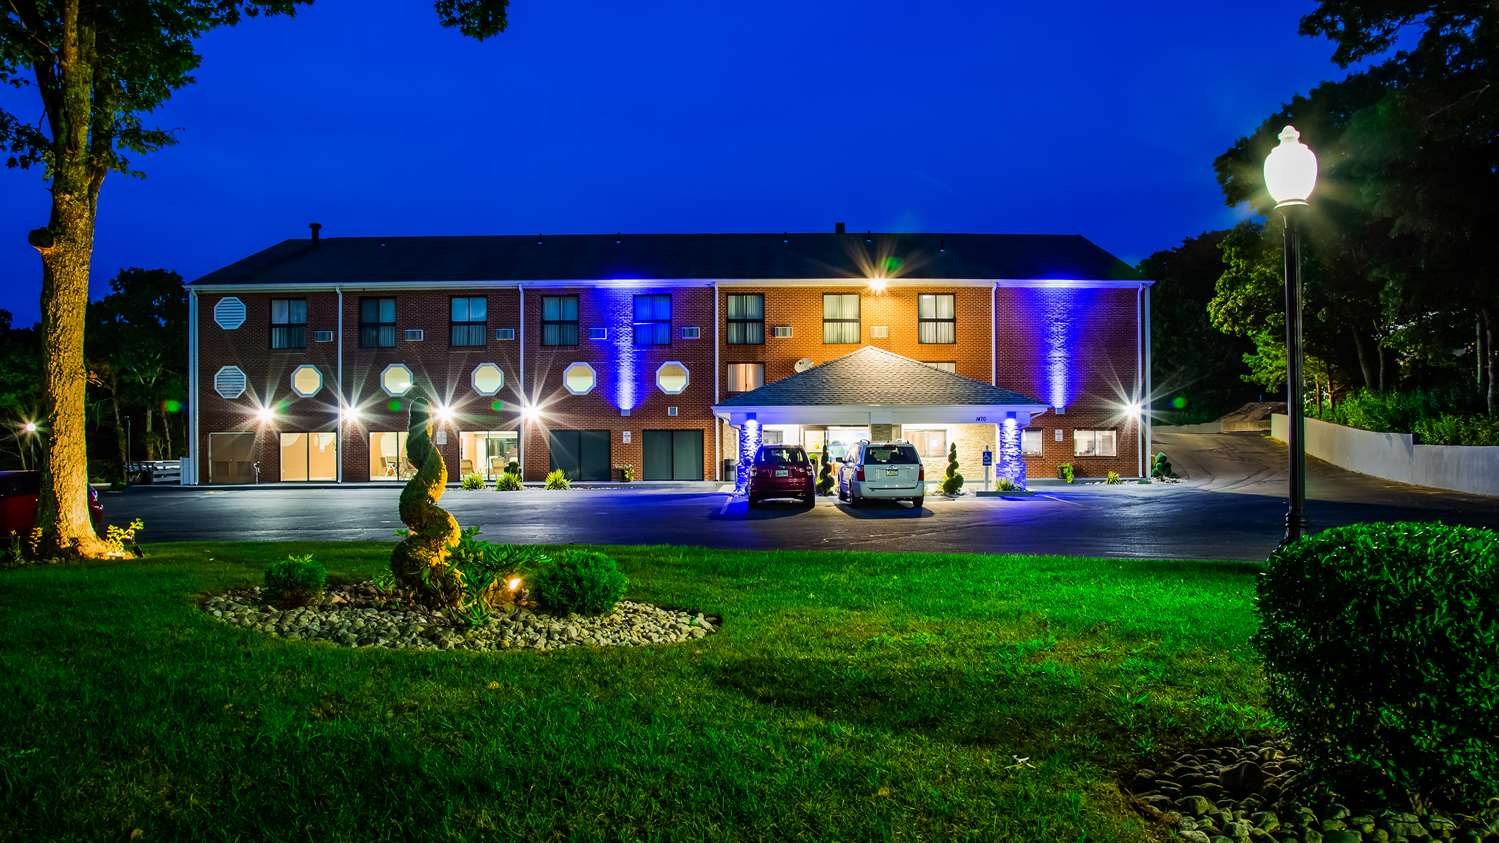 hyannis hotels best western cape cod hotel hyannis hotels best western cape cod